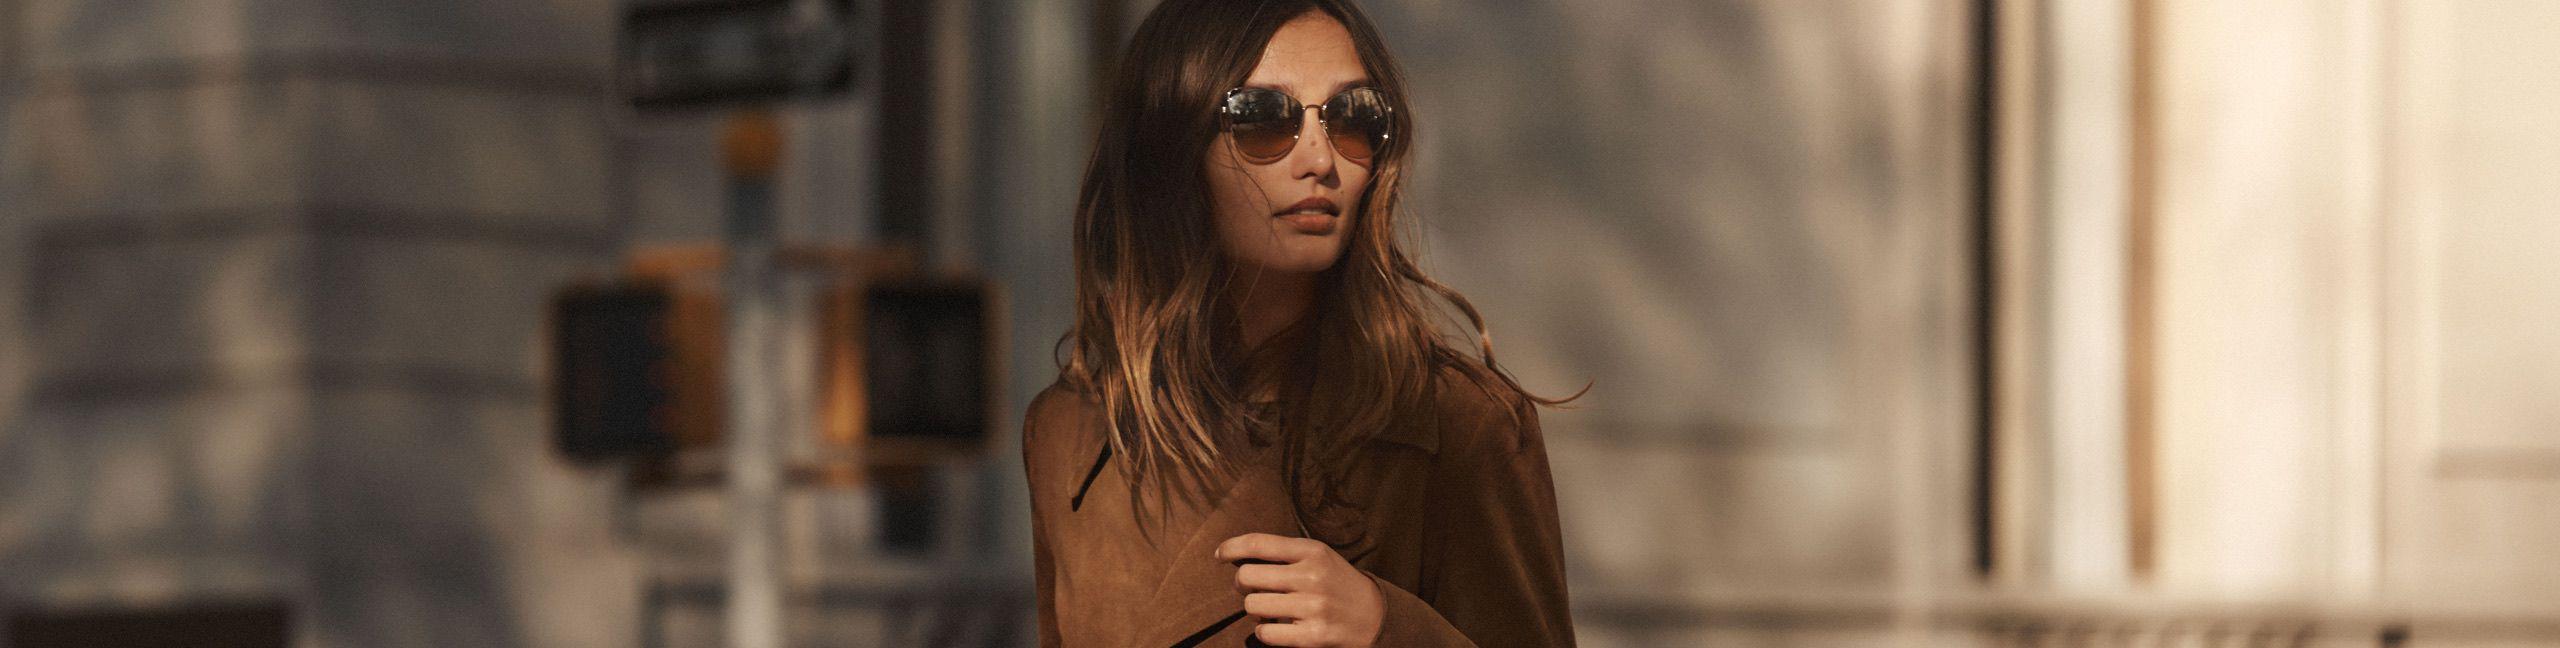 45de3b3f647 Michael Kors Women s Sunglasses Collection